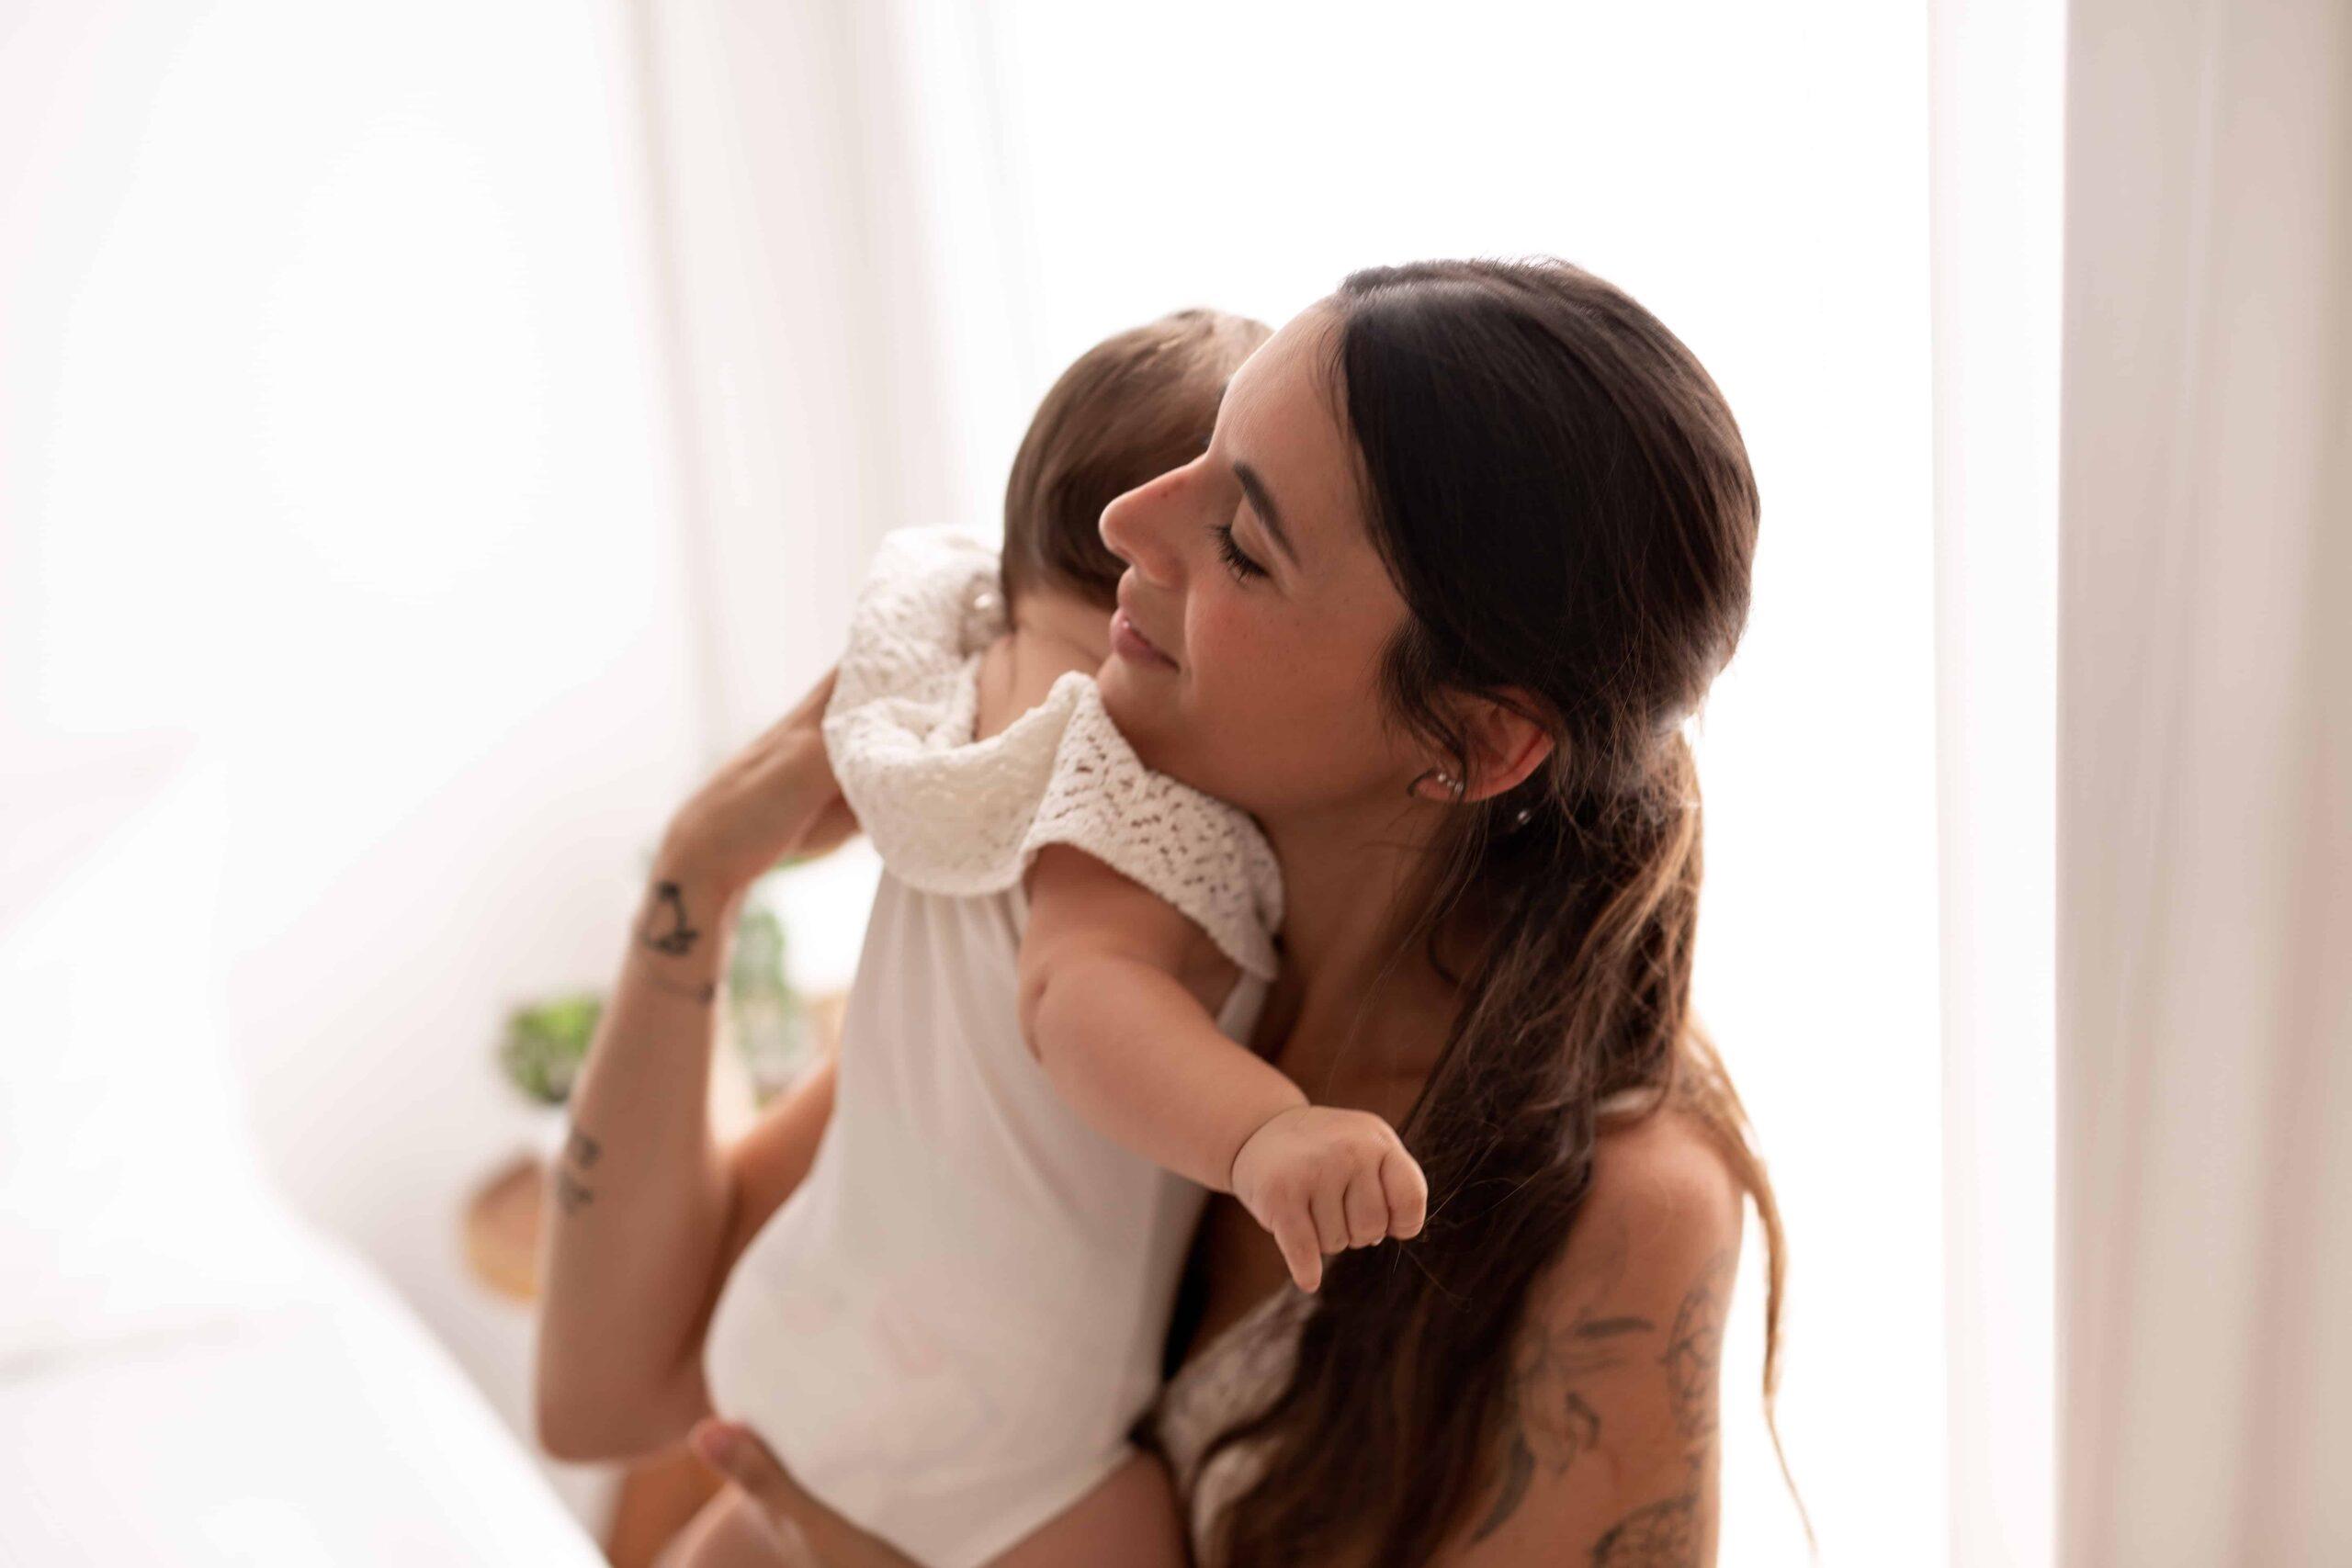 Mindfulness Mantova gestione ansia paura stress per mamme e gravidanza